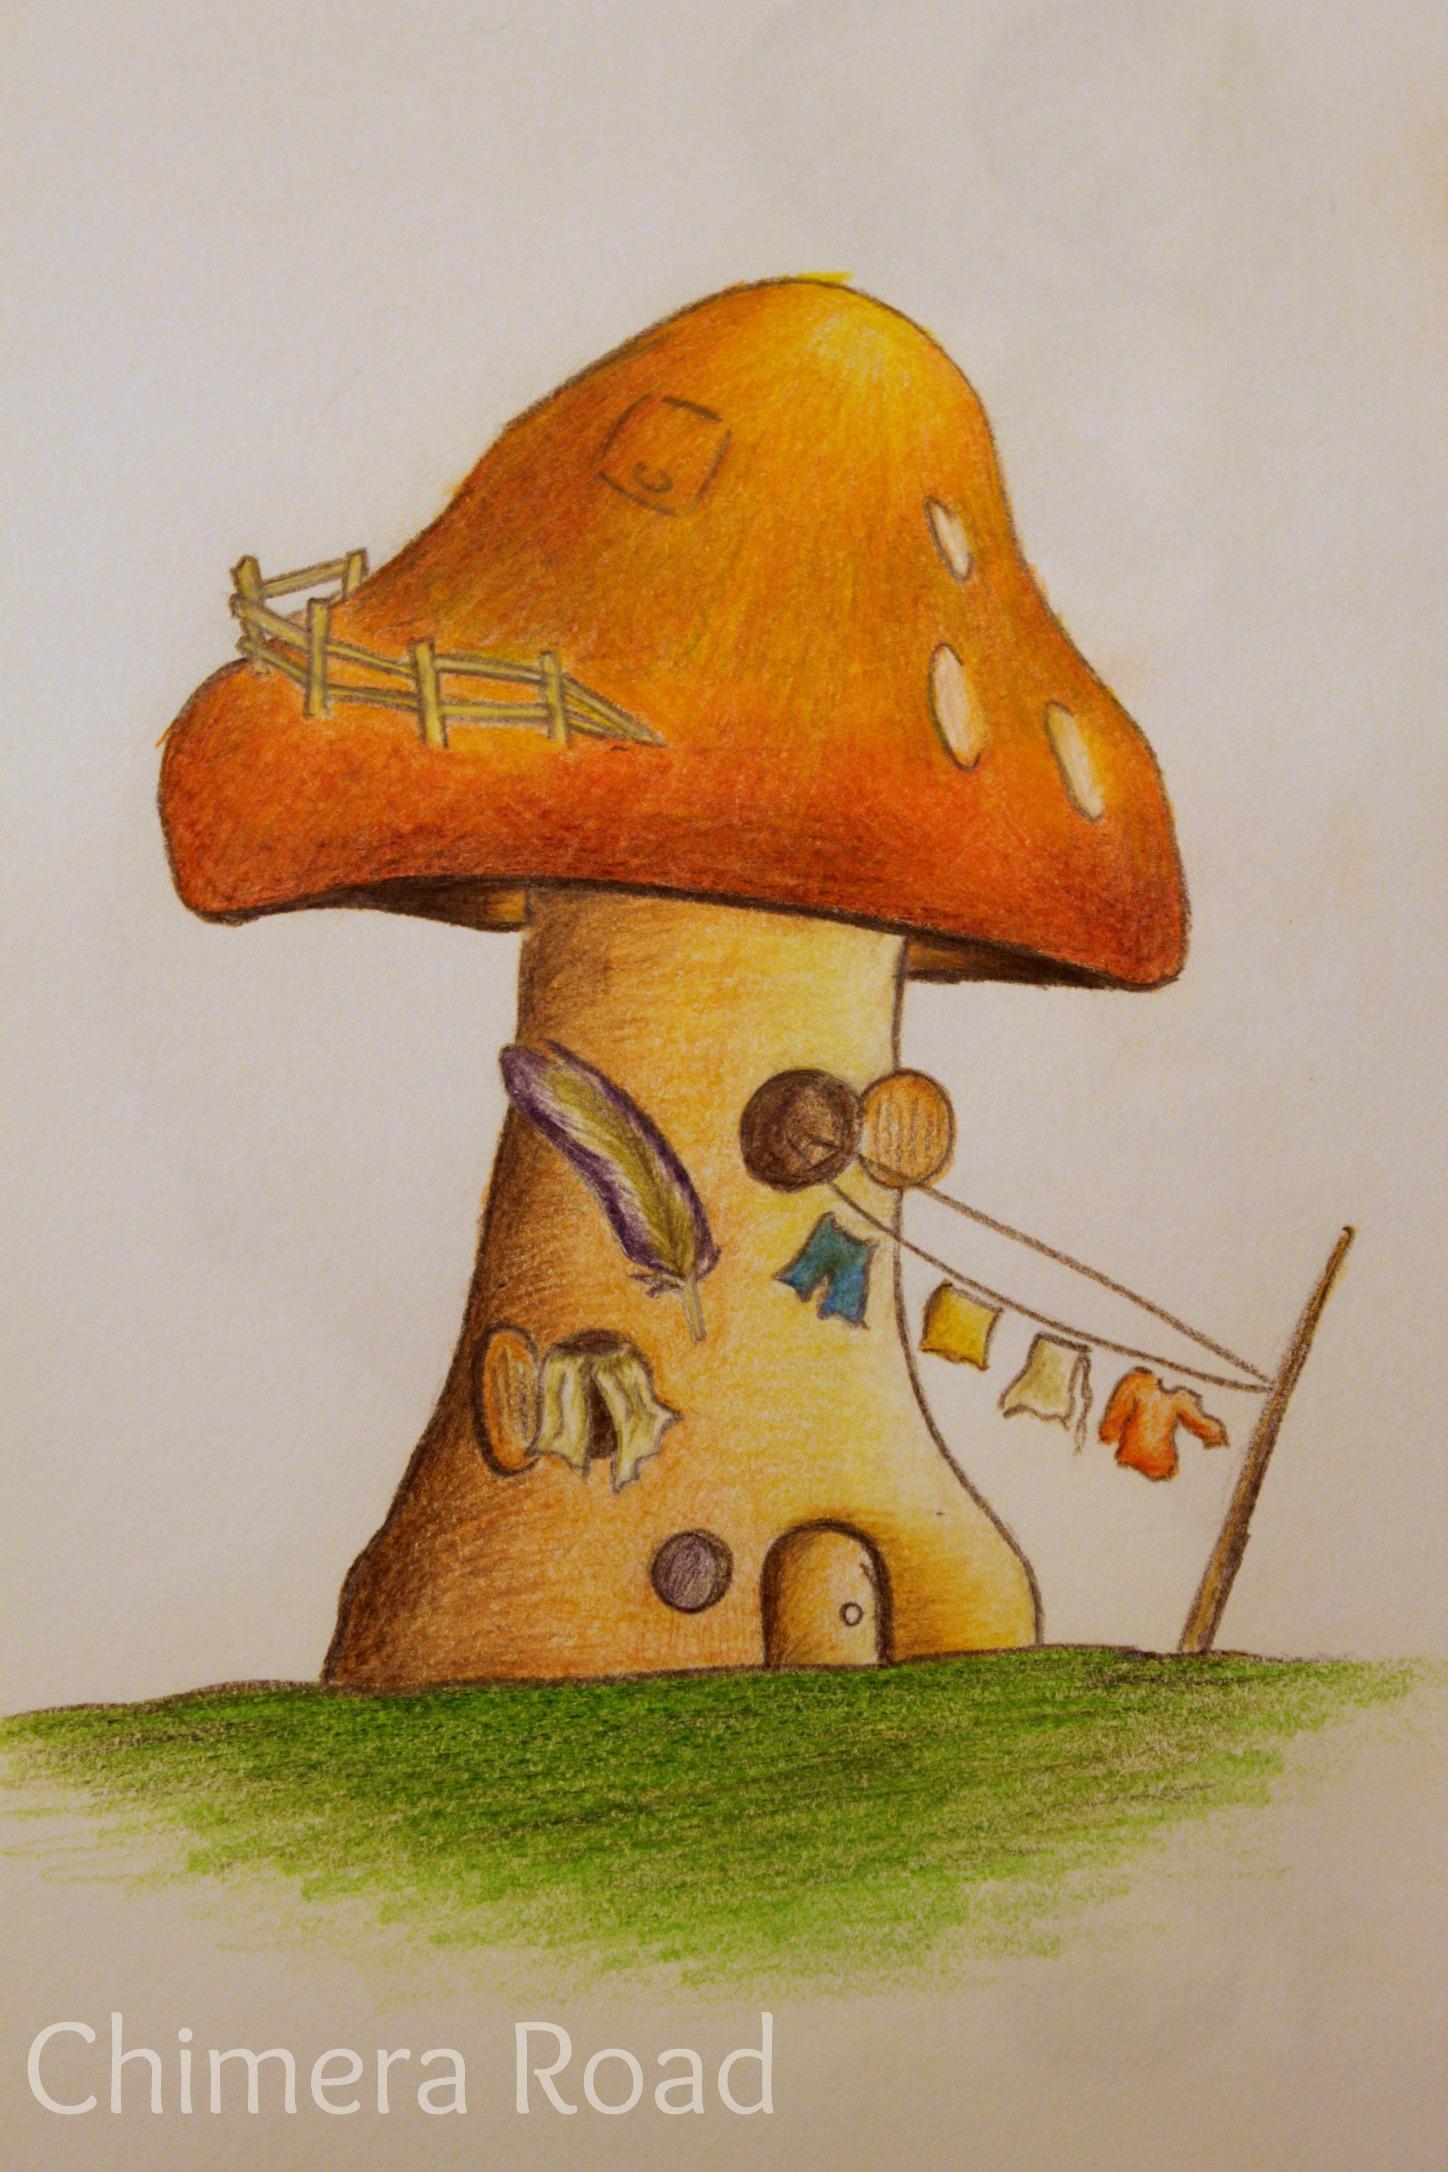 Hippie Mushroom | Dakota Midnyght Art (dakotamidnyght.com)